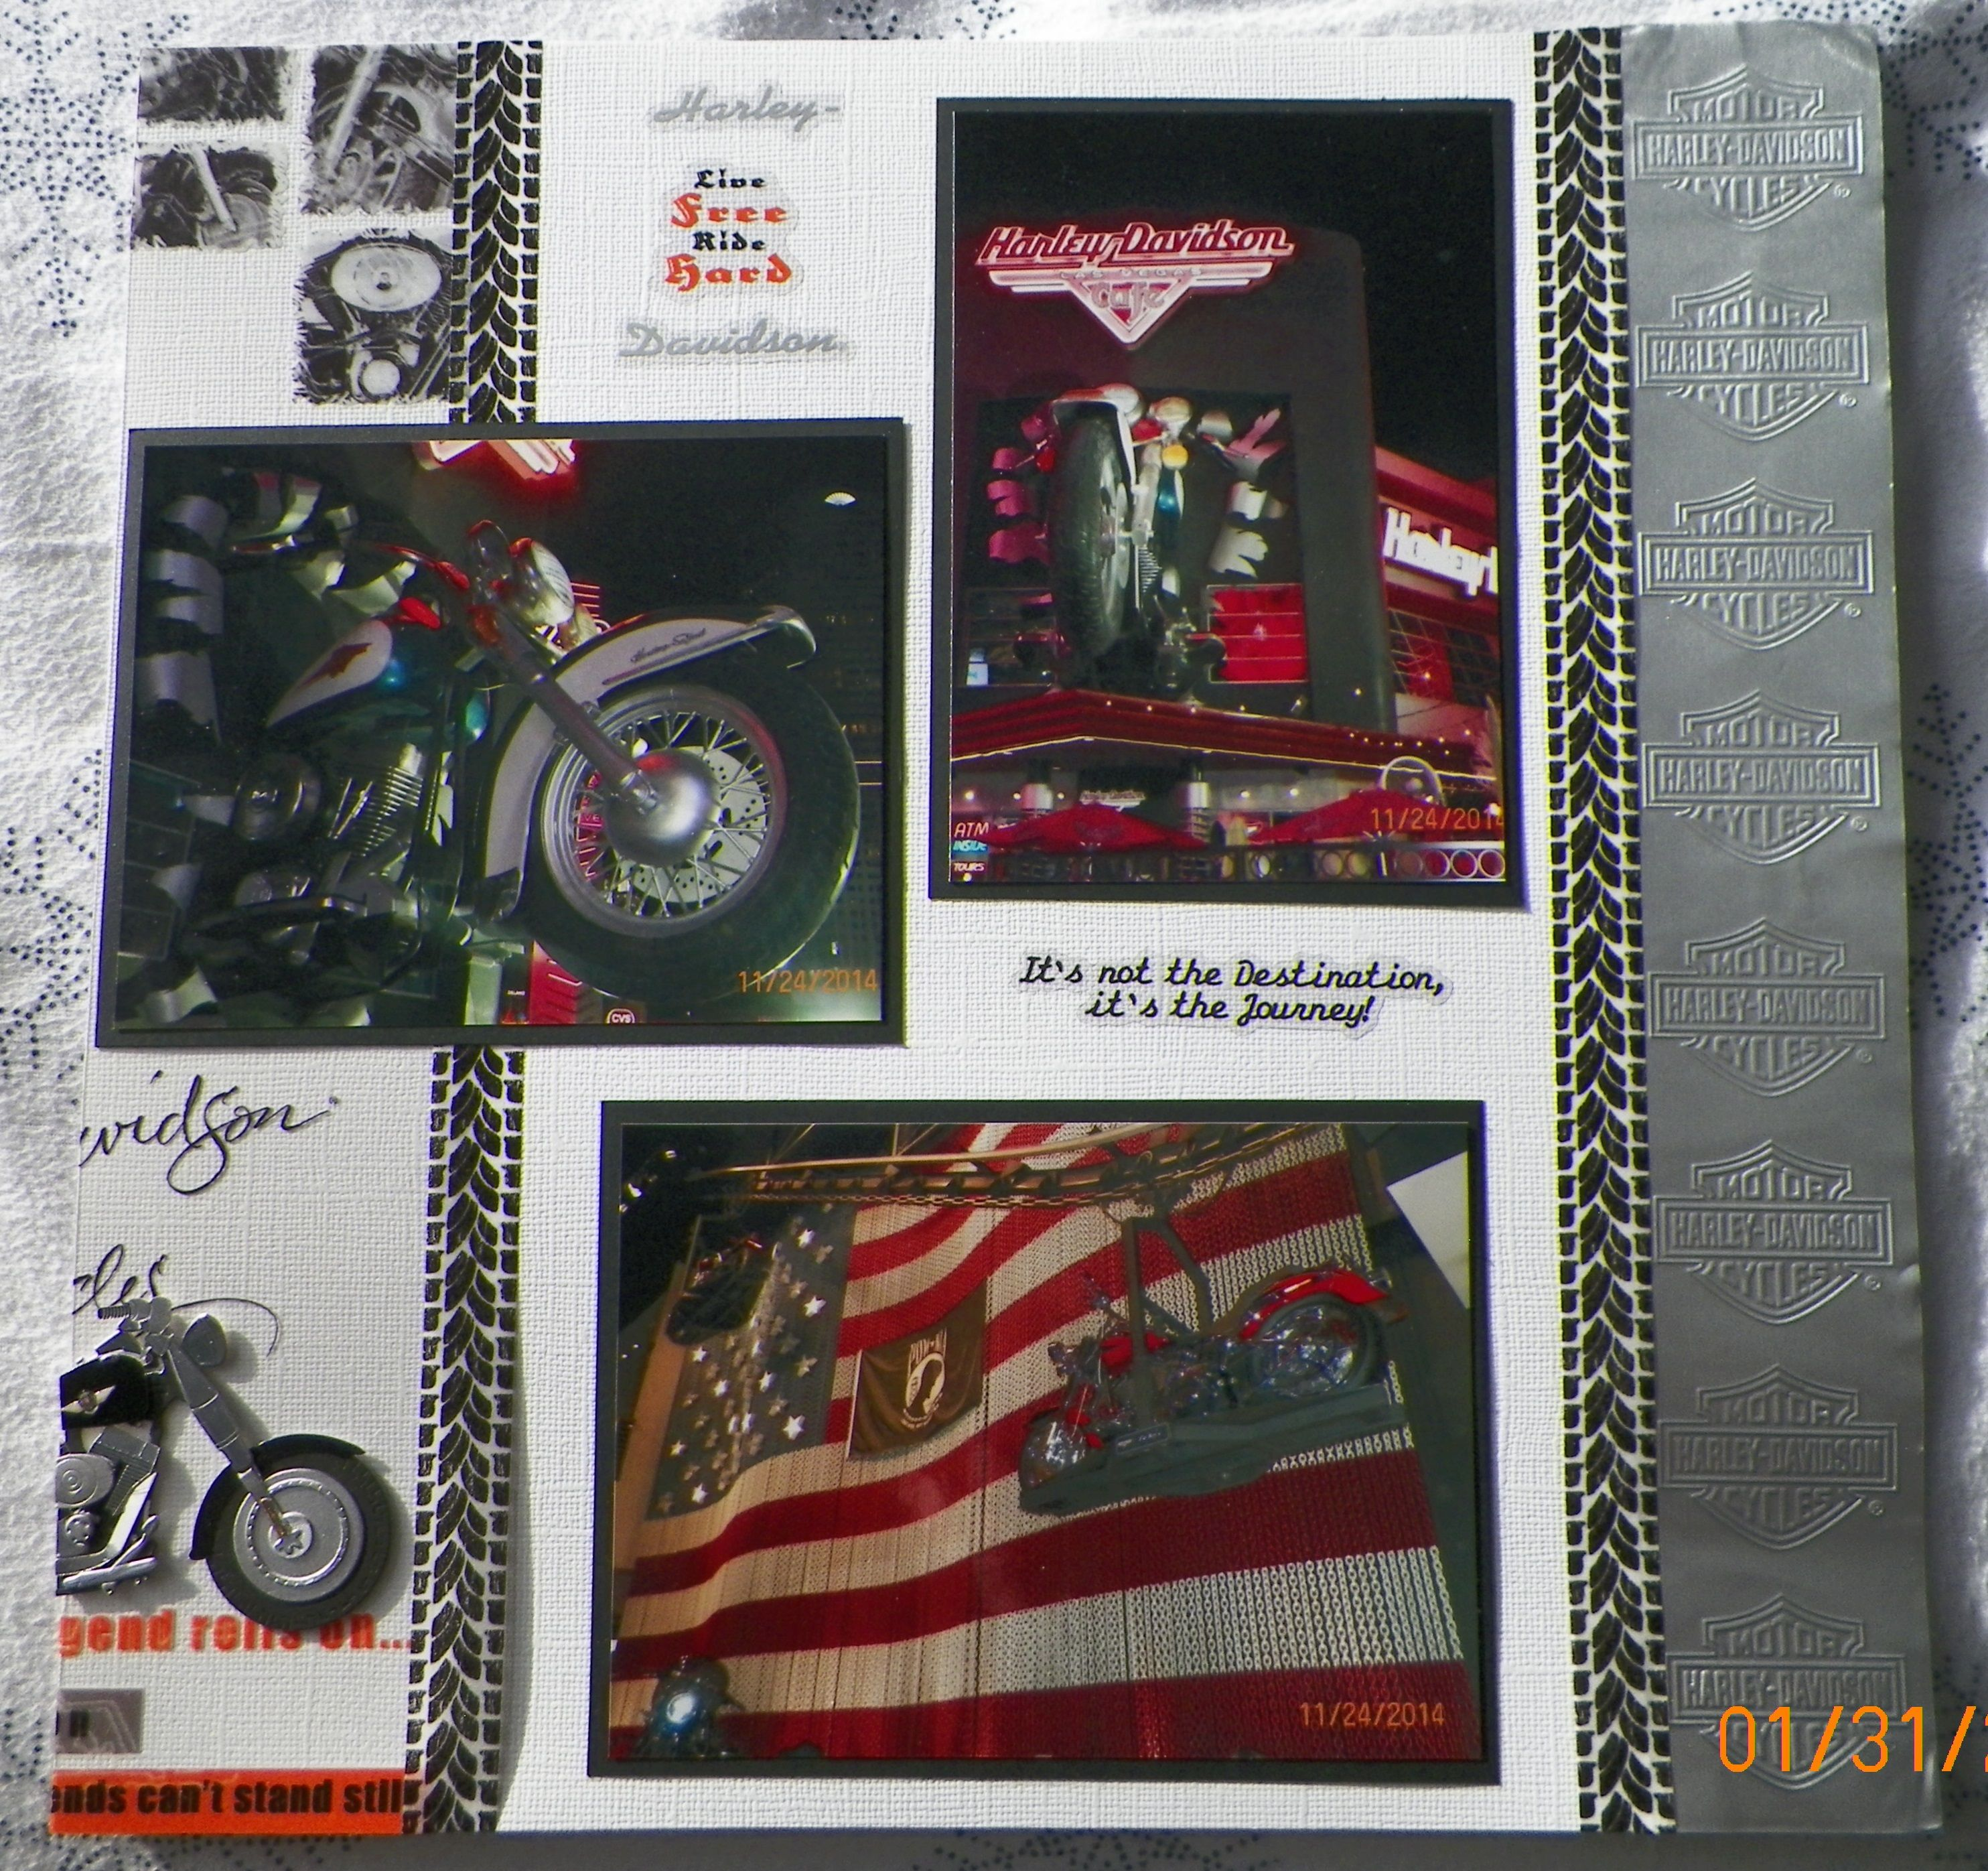 Scrapbook ideas las vegas - Handmade Scrapbook Layout Pg 2 Ek Success Harley Davidson Las Vegas